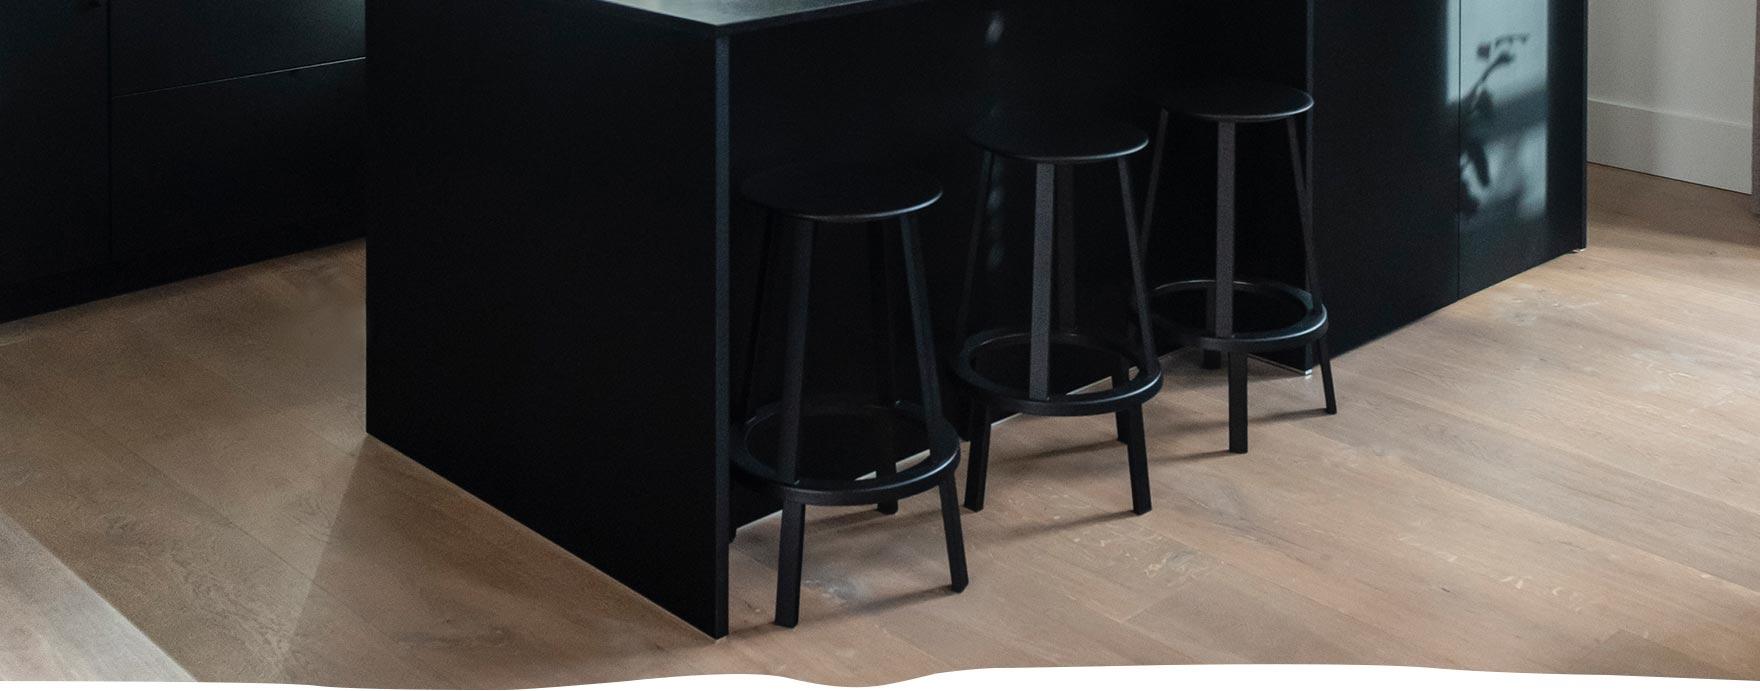 Bewerkte duoplank vloer met vloerverwarming - De Hout Snip